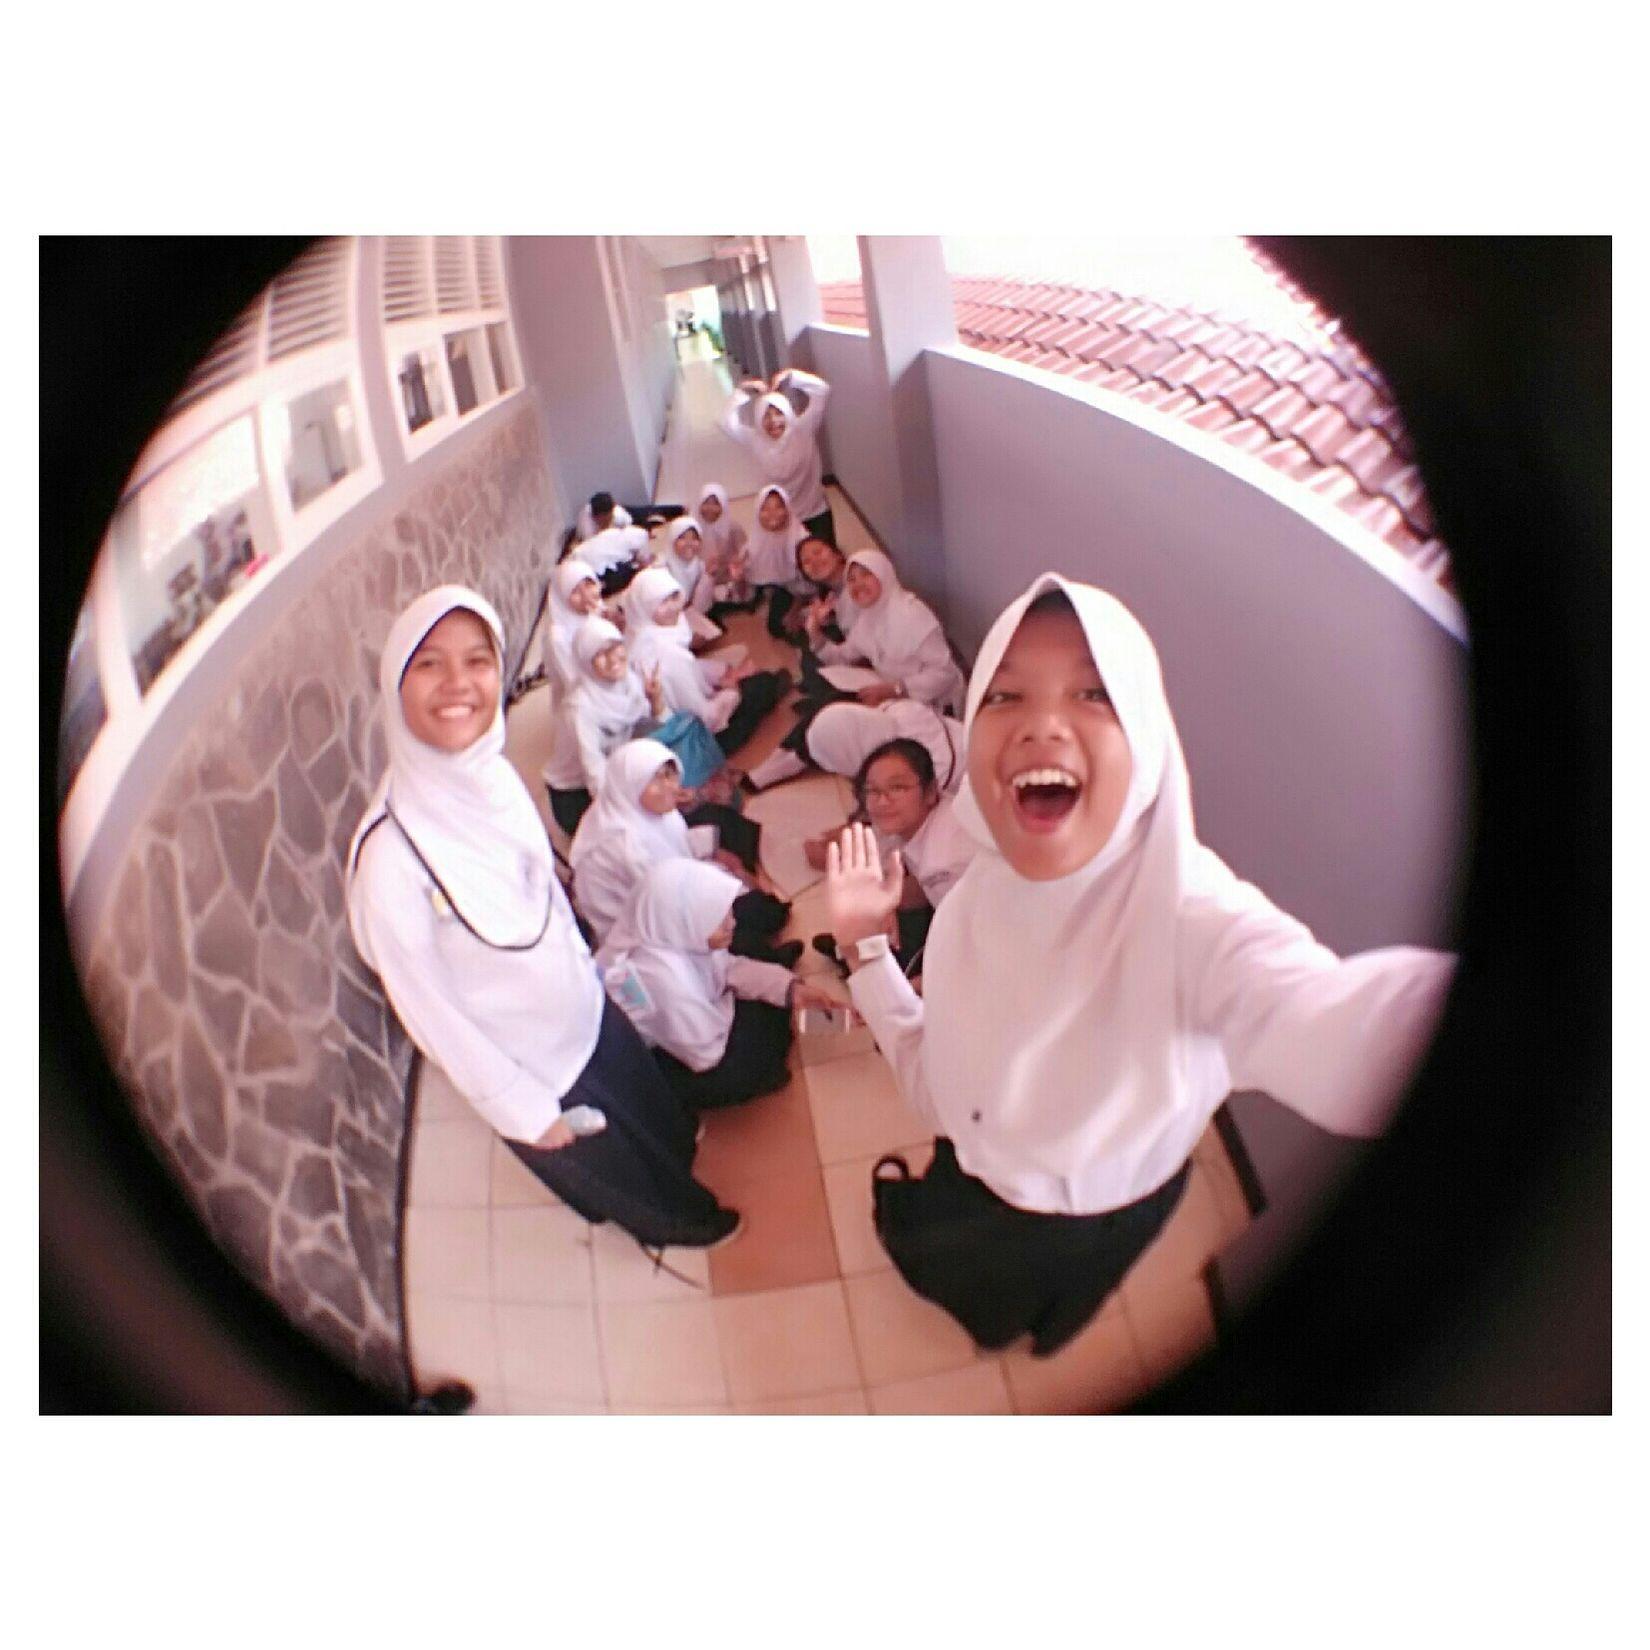 ??? Friendship Class Selfie Girls Photo Fish Eye Friday Hello Yeay Beloved